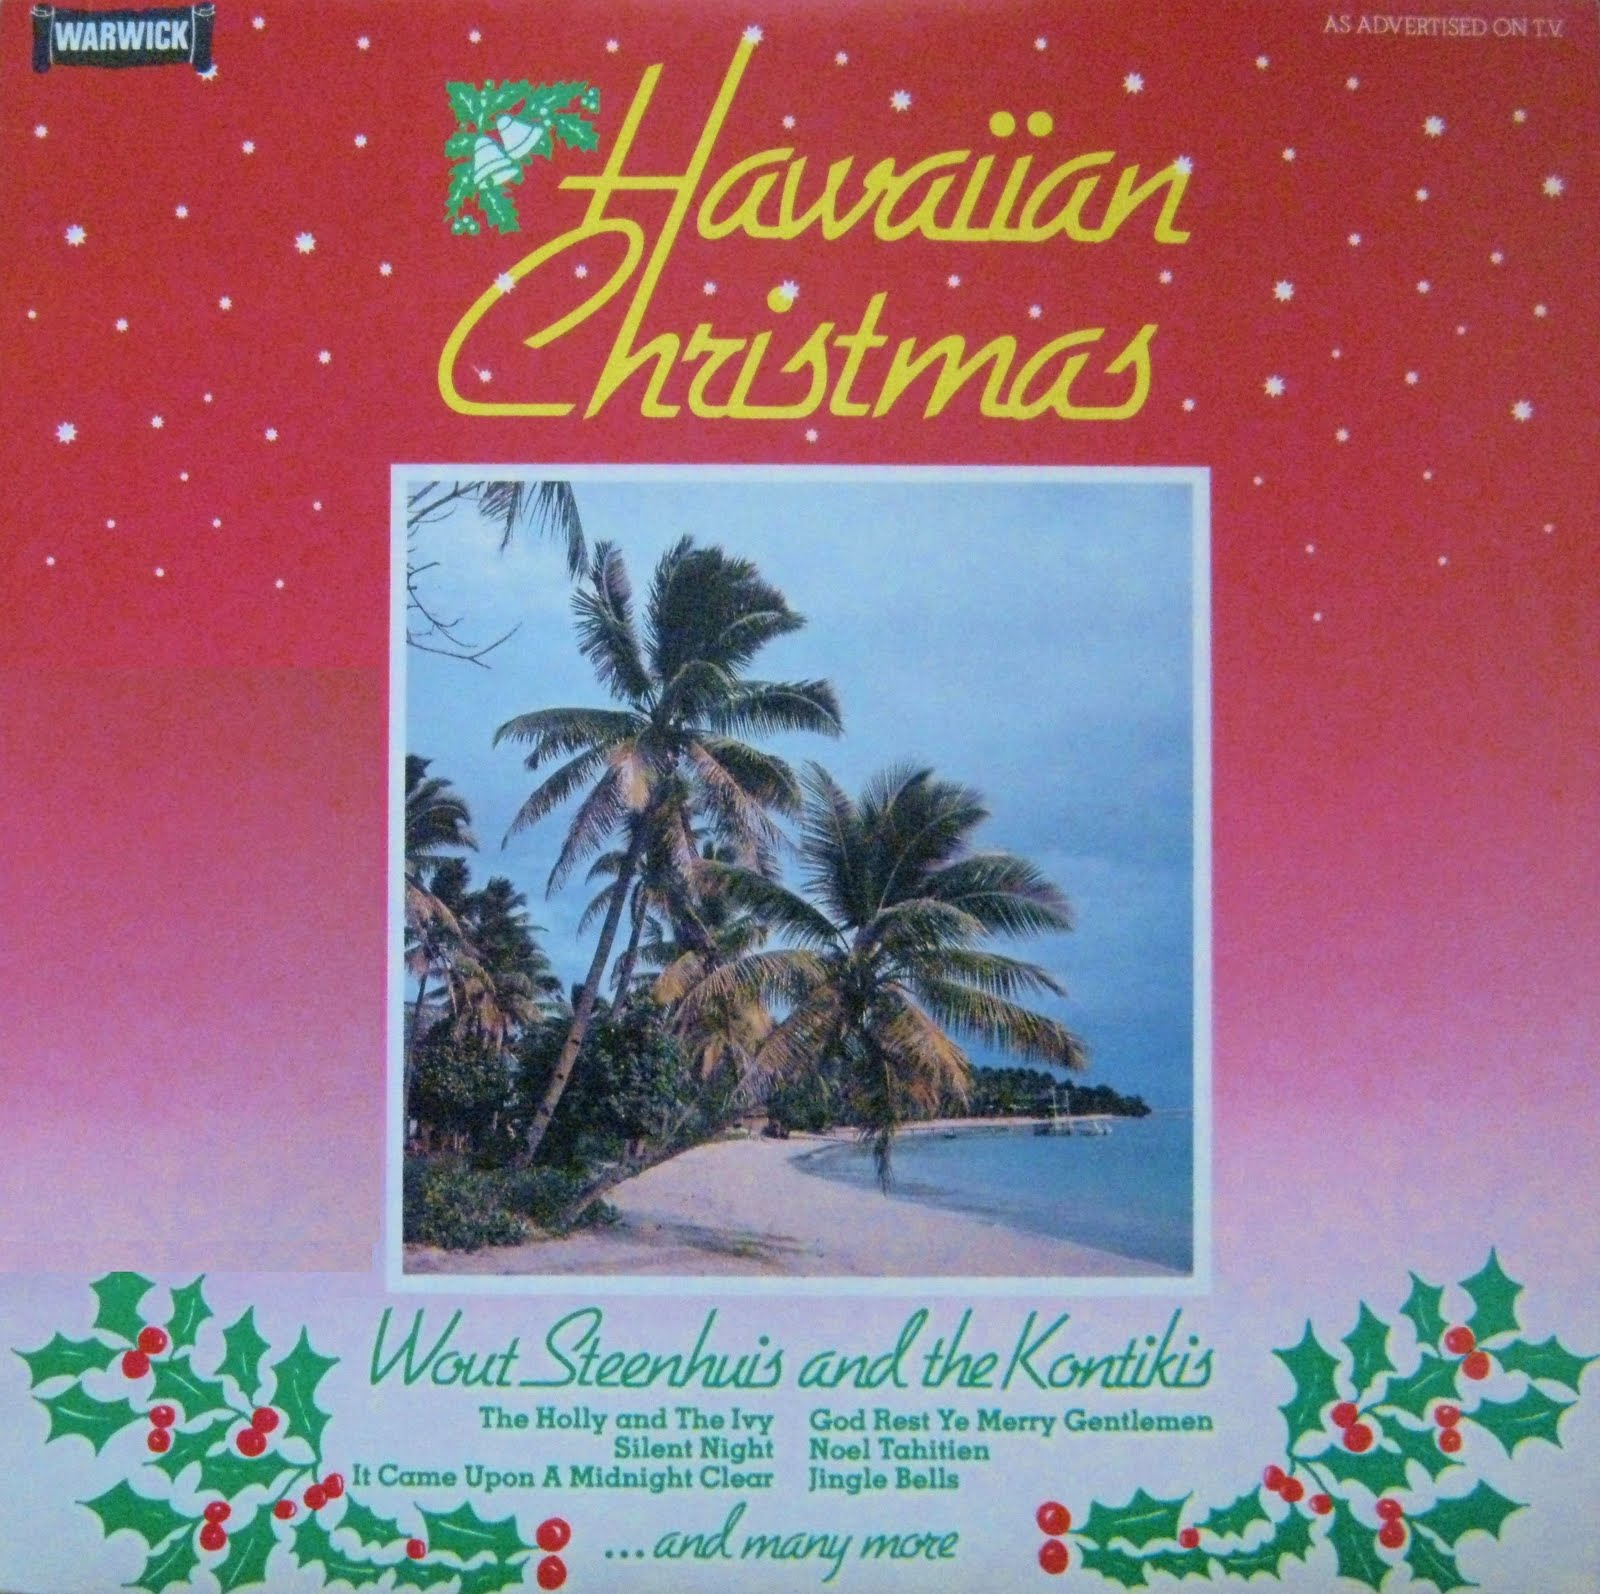 Easy Listening World Hawaiian Christmas Wout Steenhuis 1981